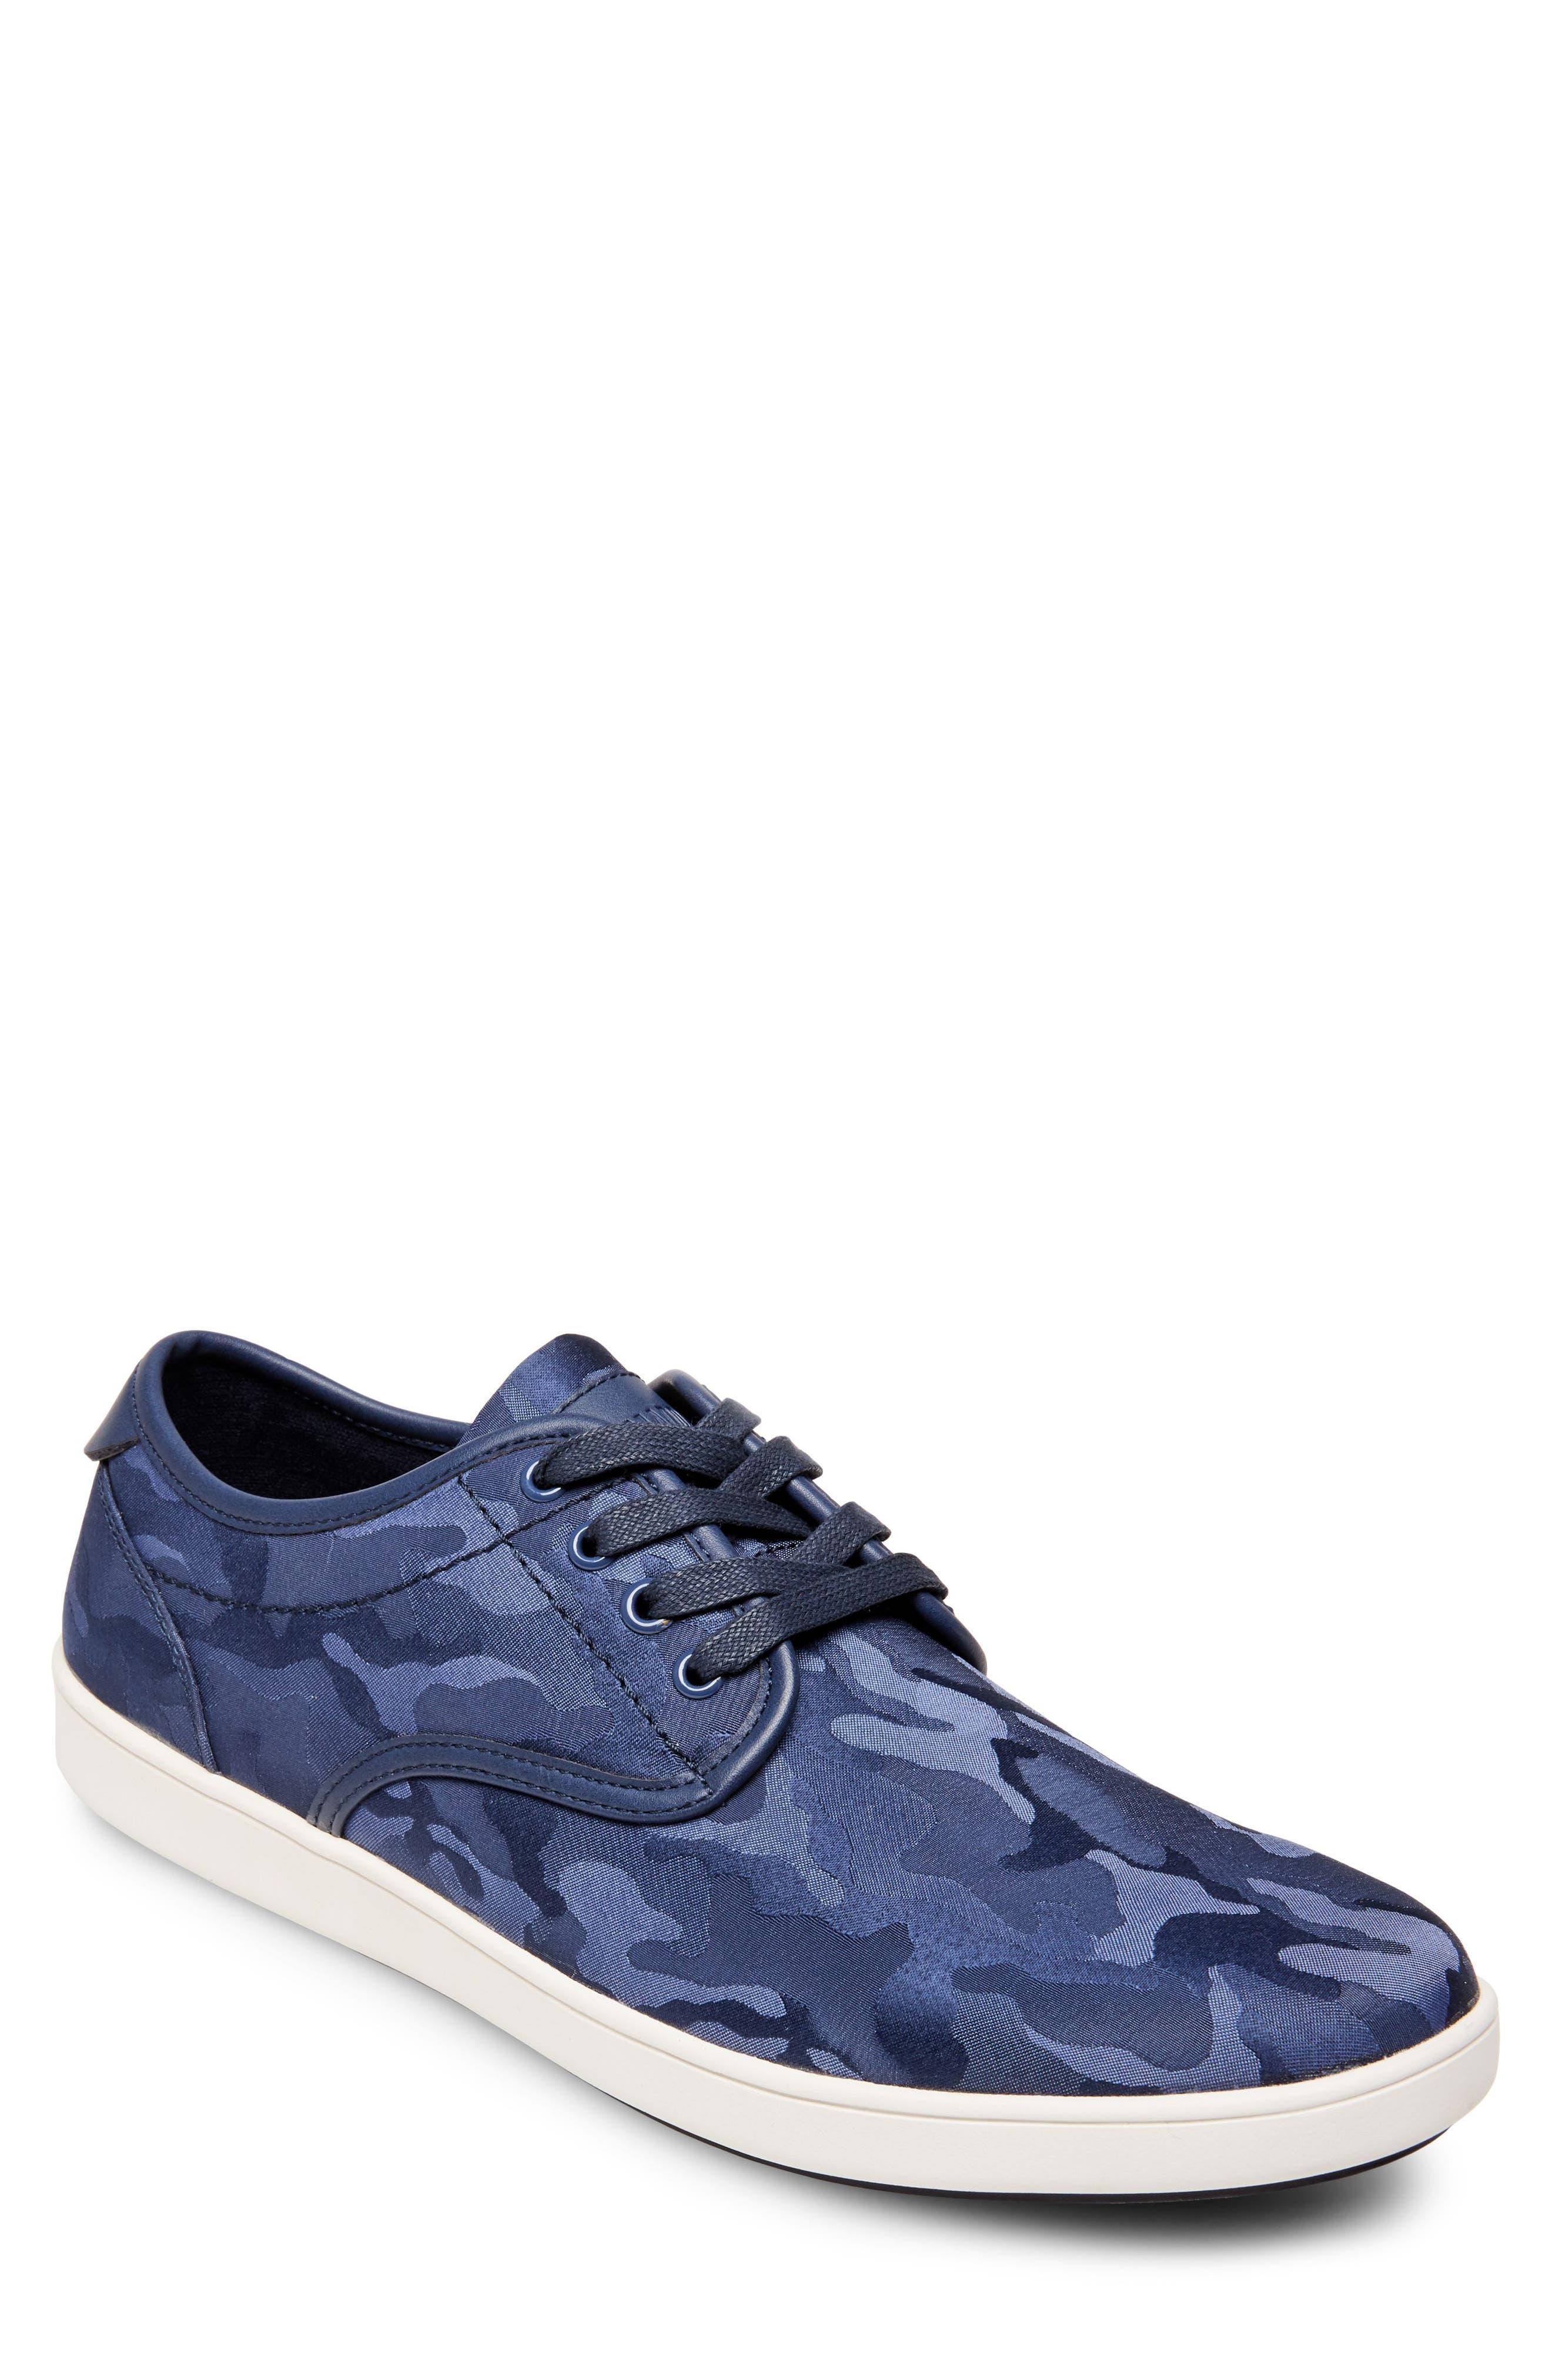 Frenzo Camo Sneaker,                             Main thumbnail 1, color,                             Blue Camo Fabric